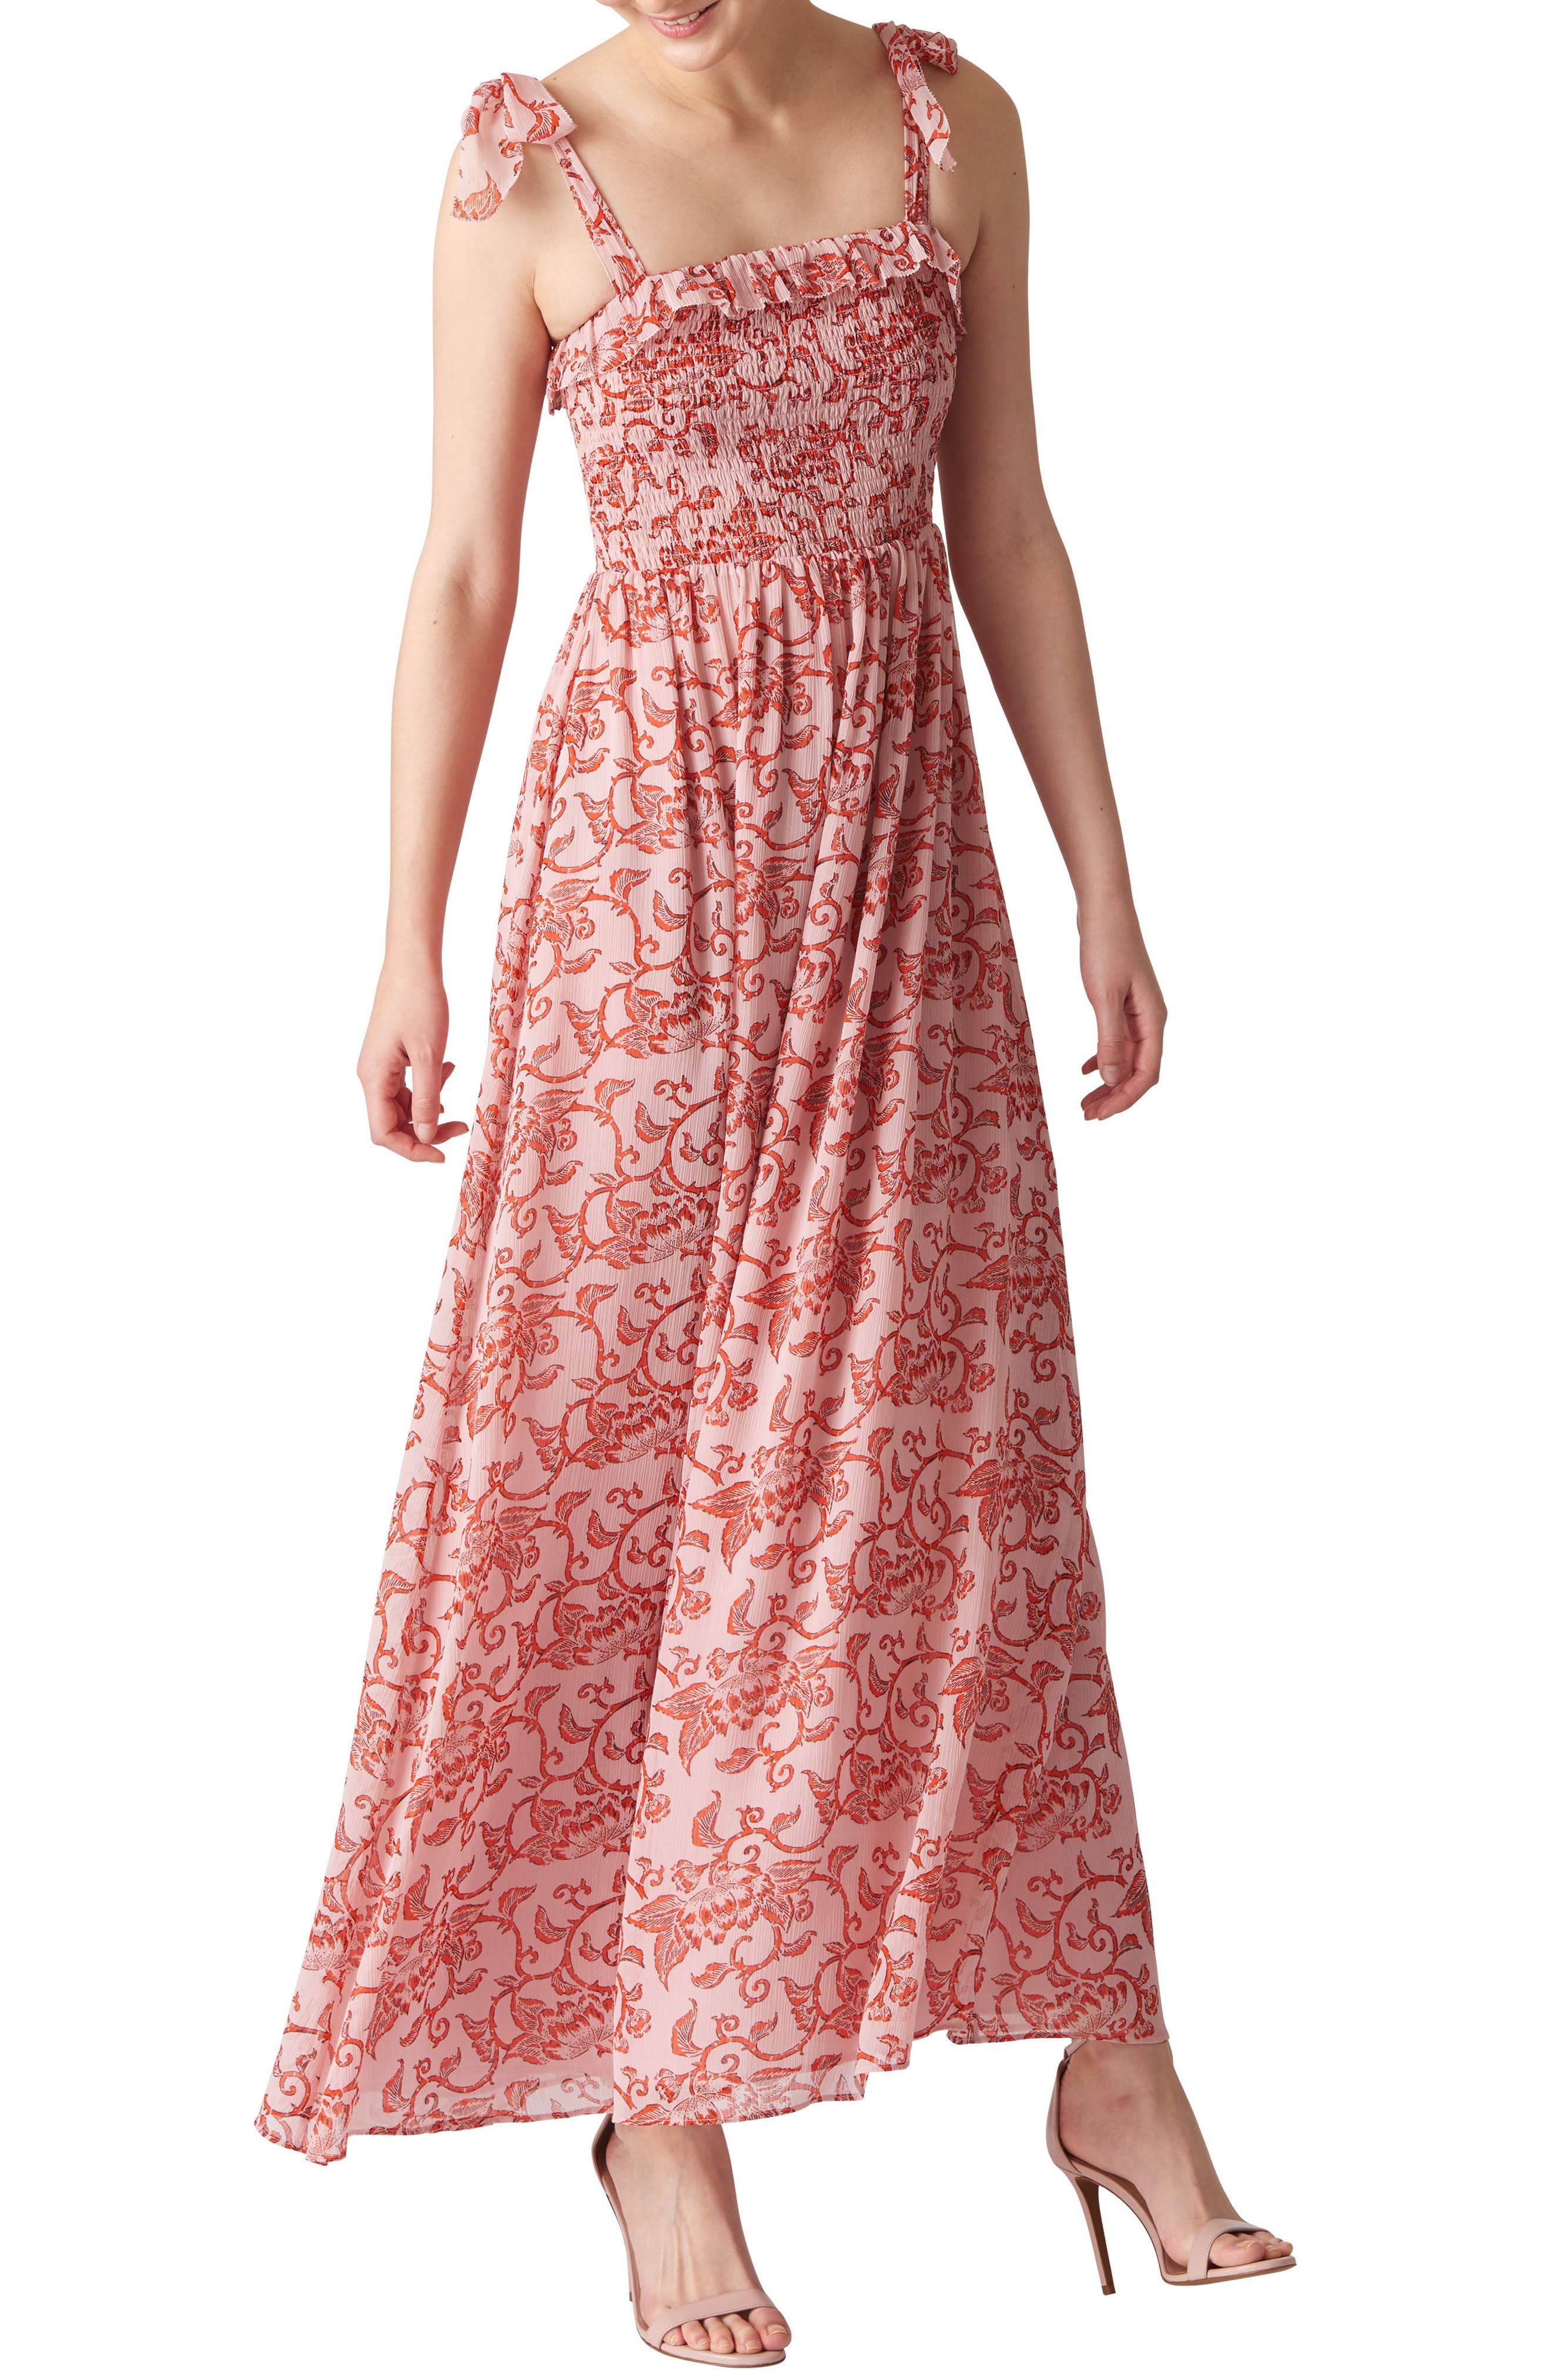 Bali Print Maxi Dress,                         Main,                         color, Pink/ Multi